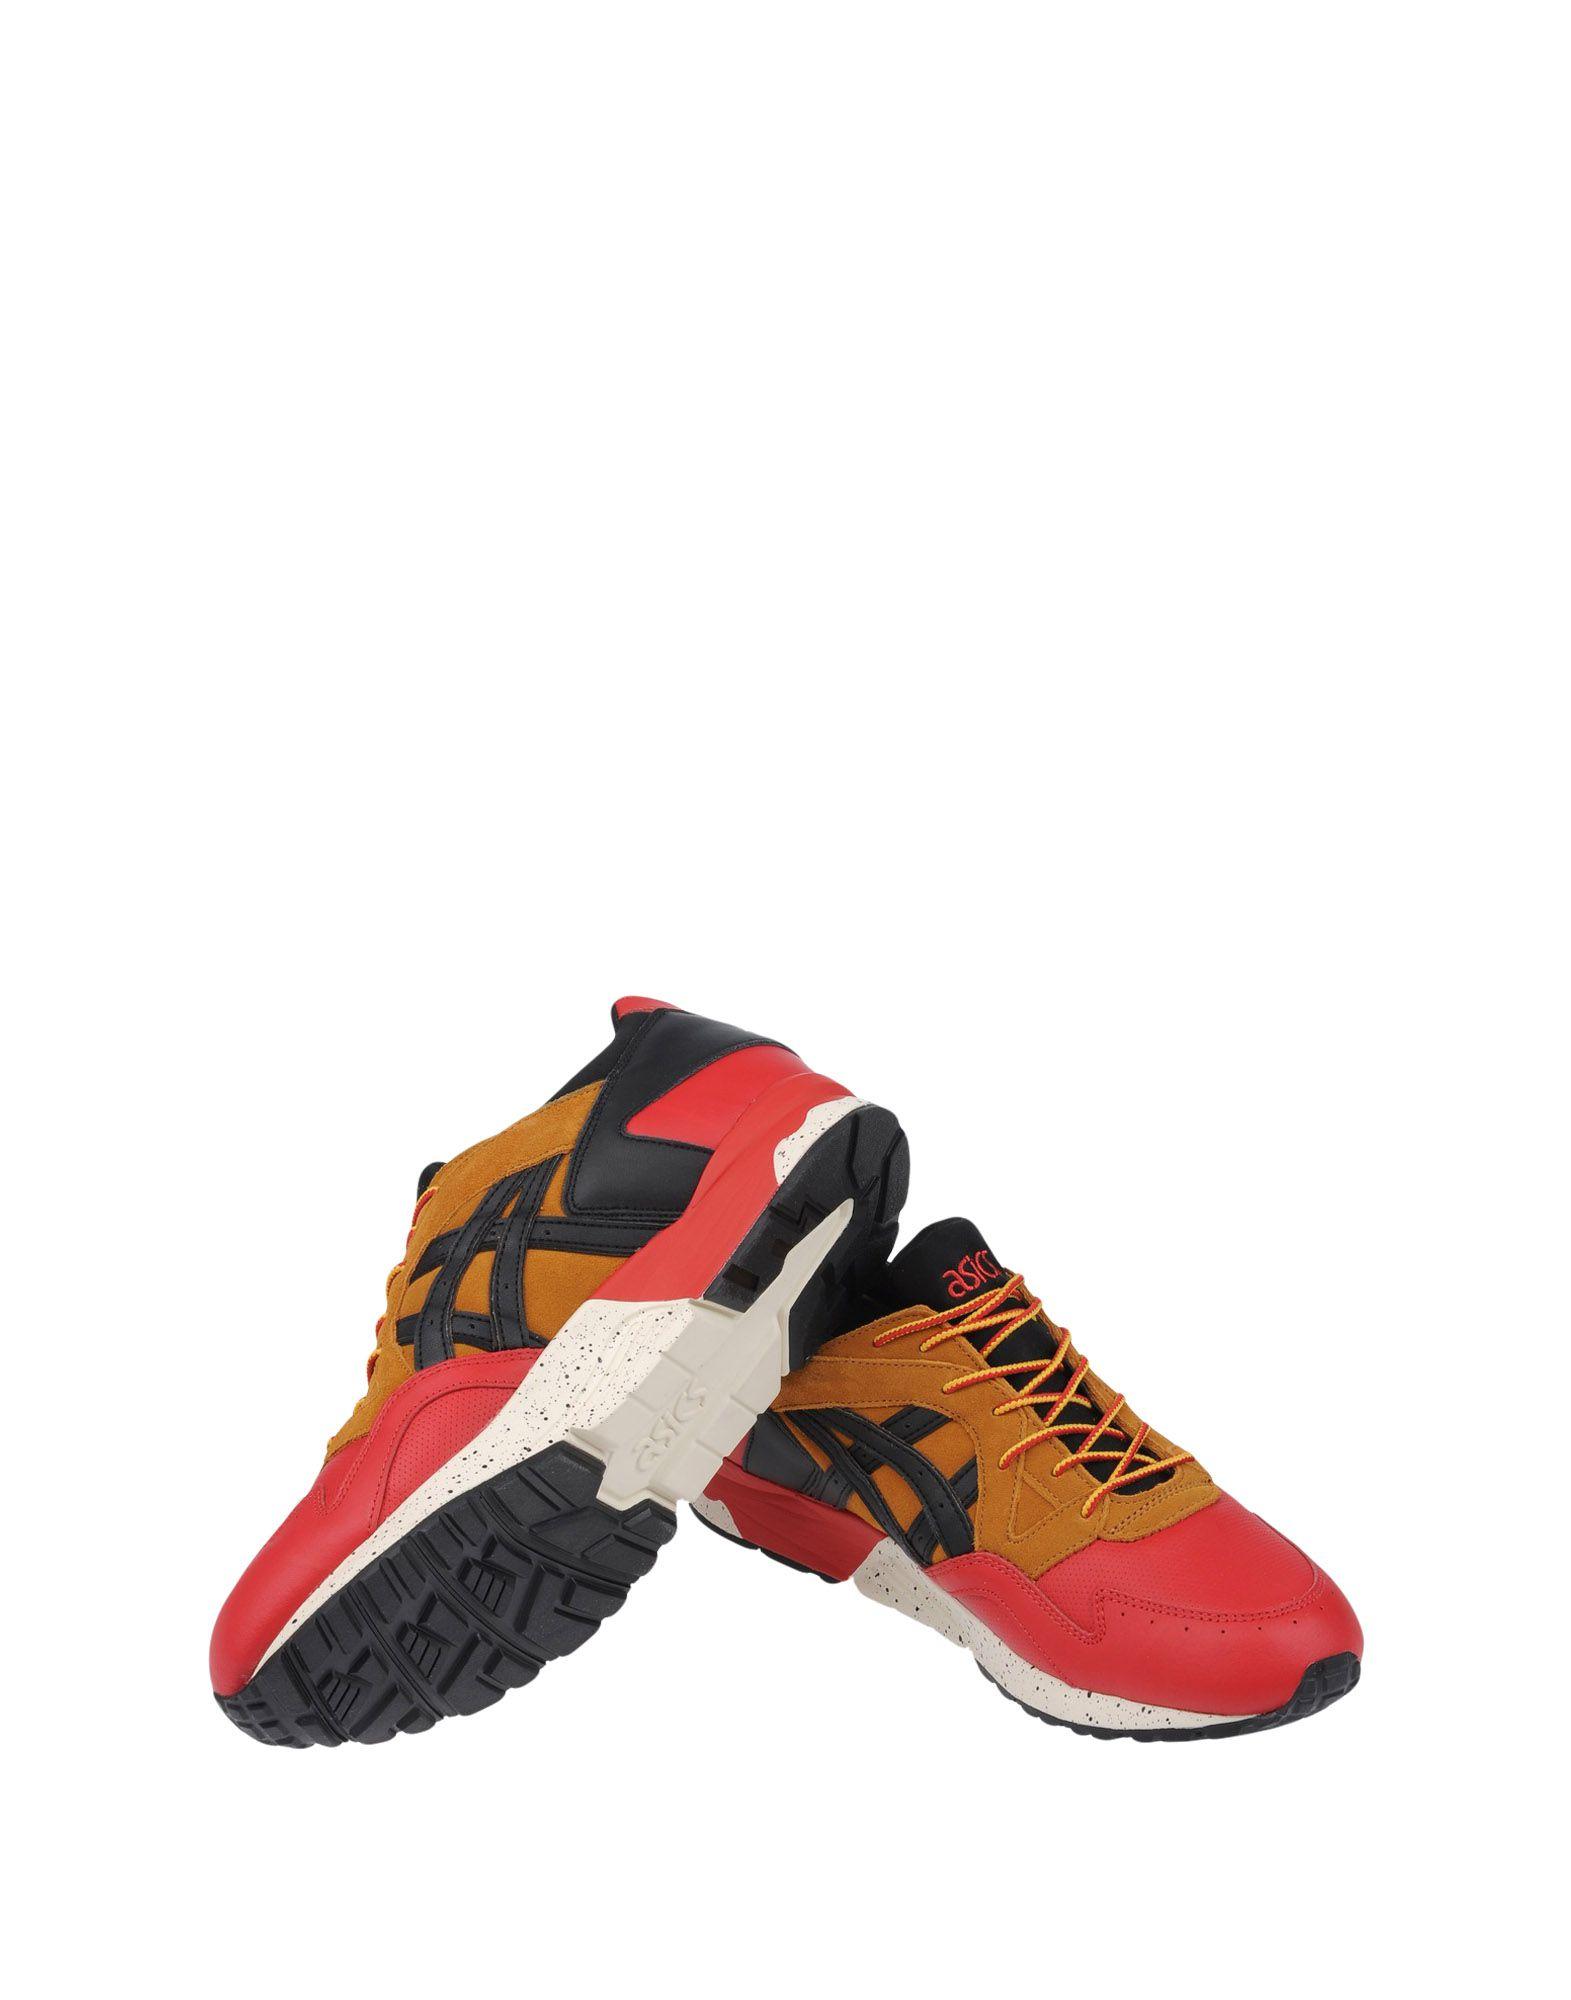 Sneakers Asics Tiger Gel-Lyte V G-Tx - Homme - Sneakers Asics Tiger sur